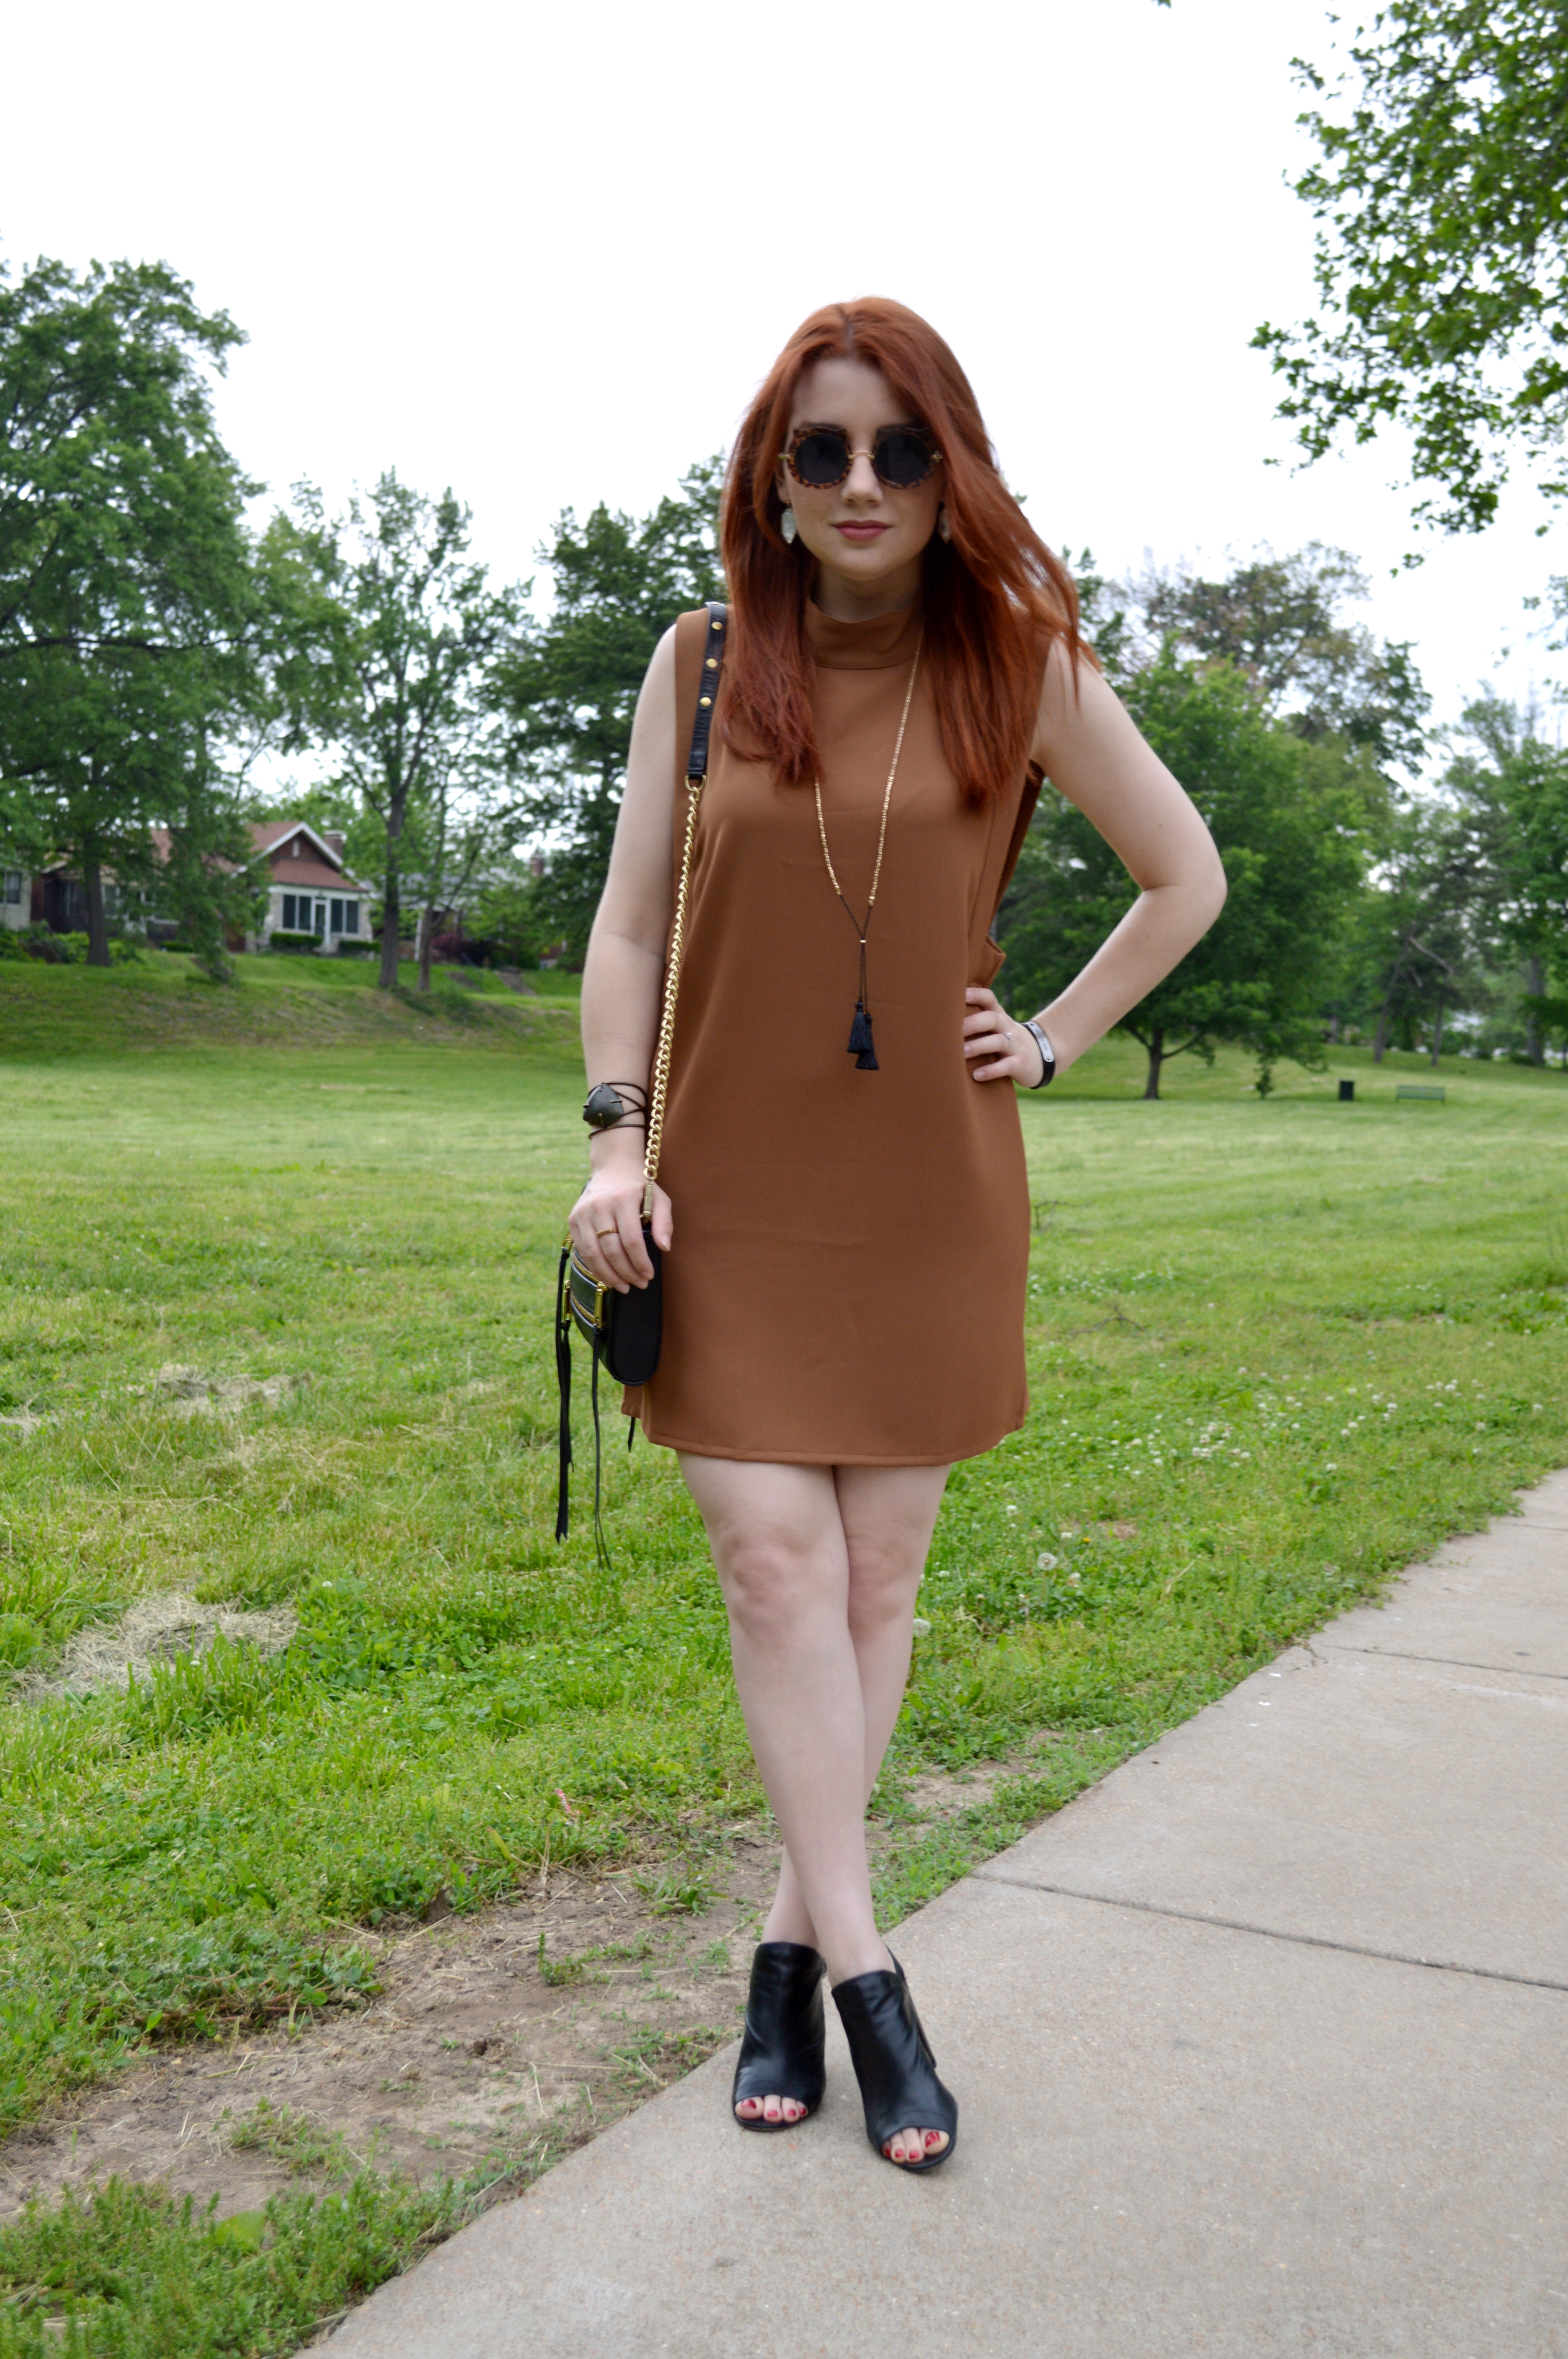 Oh Julia Ann - Brown Tobi Shift Dress with Peep Toe Booties - Summer Outfit Idea - Rebecca Minkoff Crossbody Bag - STL Blog (2)